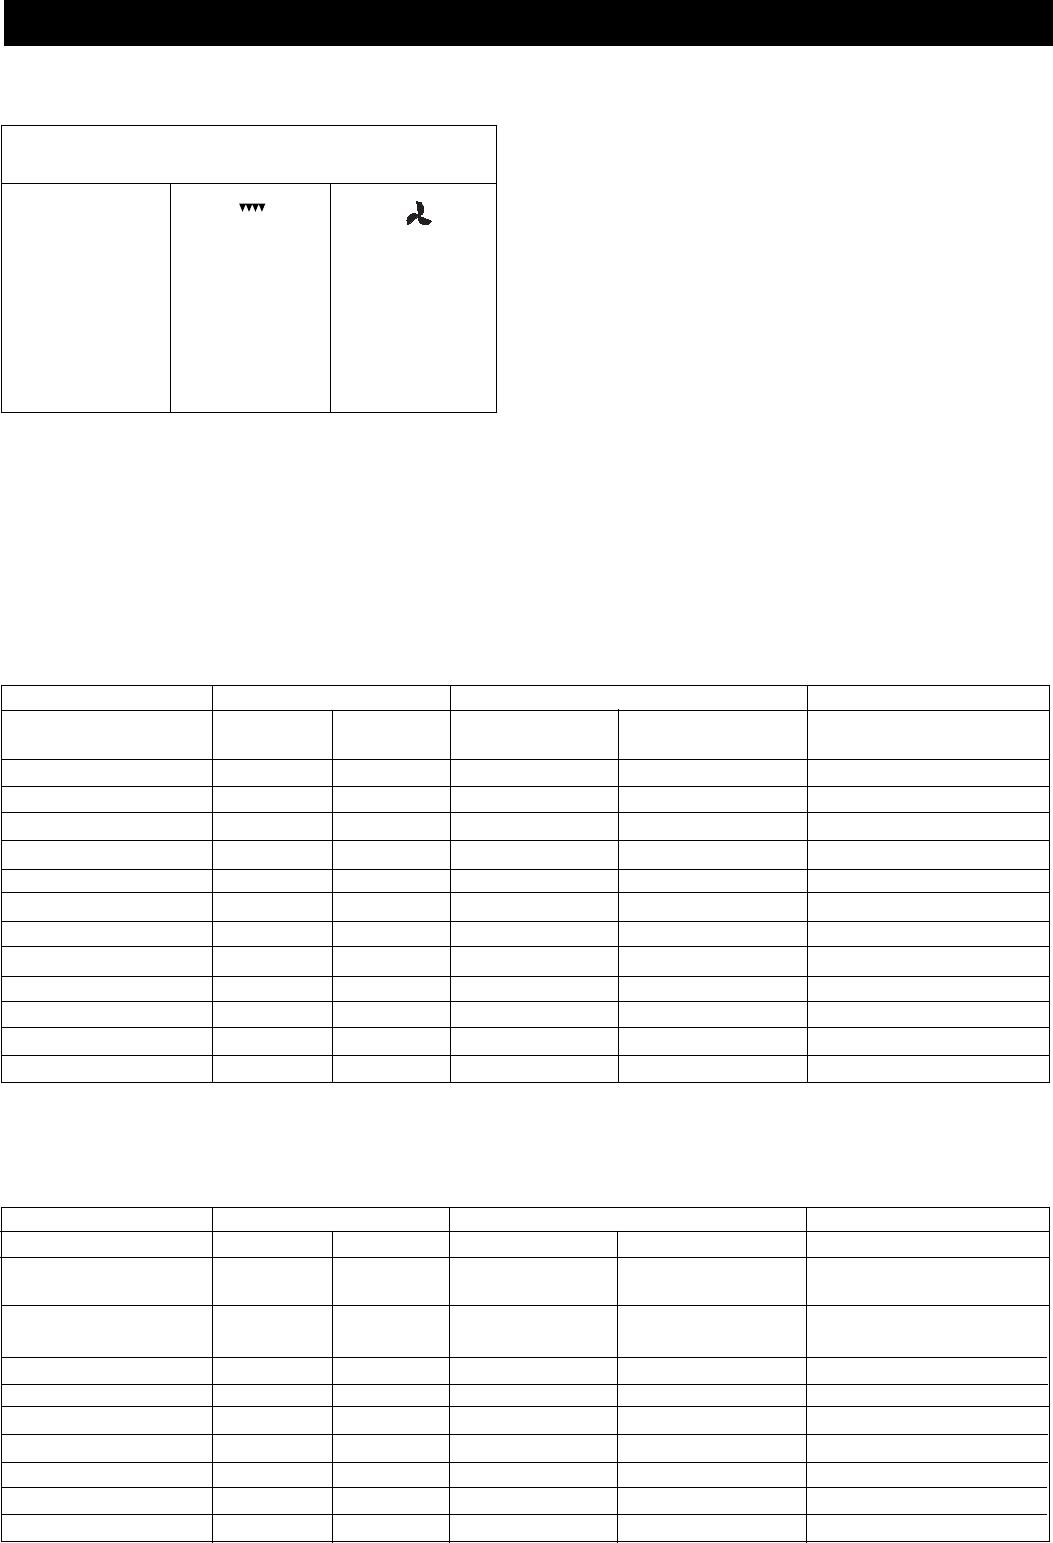 Handleiding ATAG FG 1011 N (pagina 13 van 32) (Deutsch, English ...